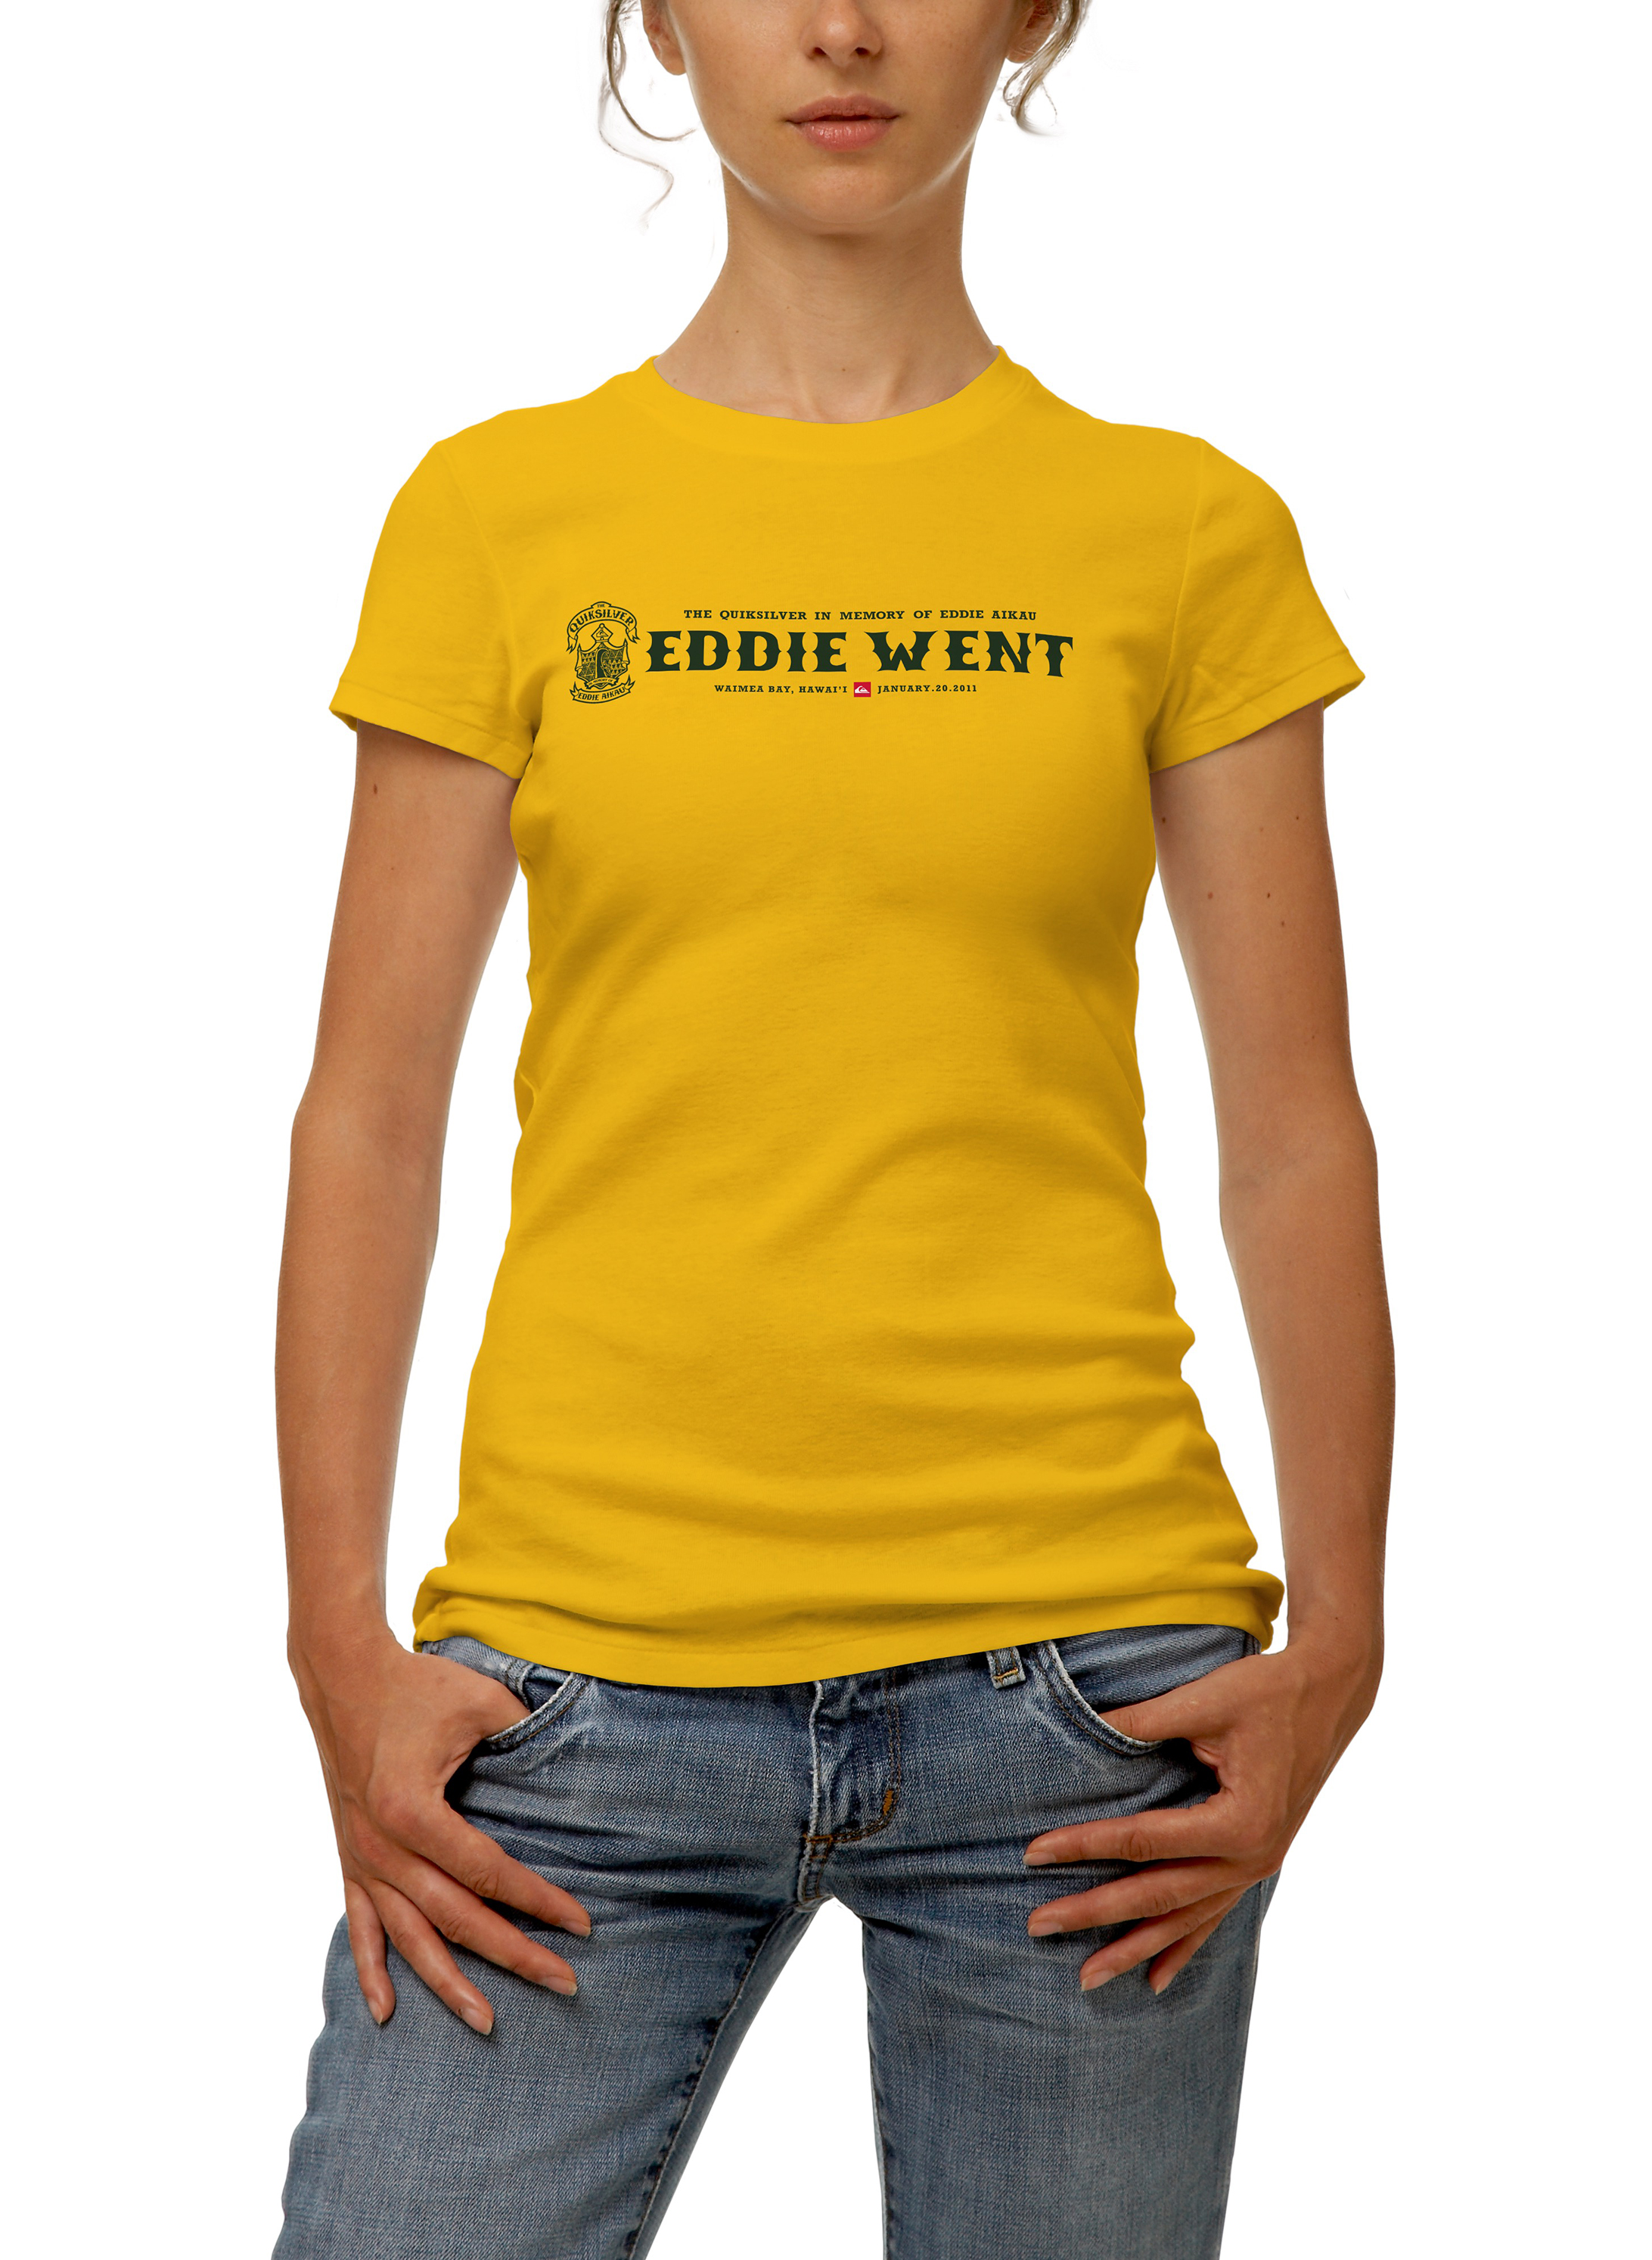 Shirt 0245-1 2016-04-11